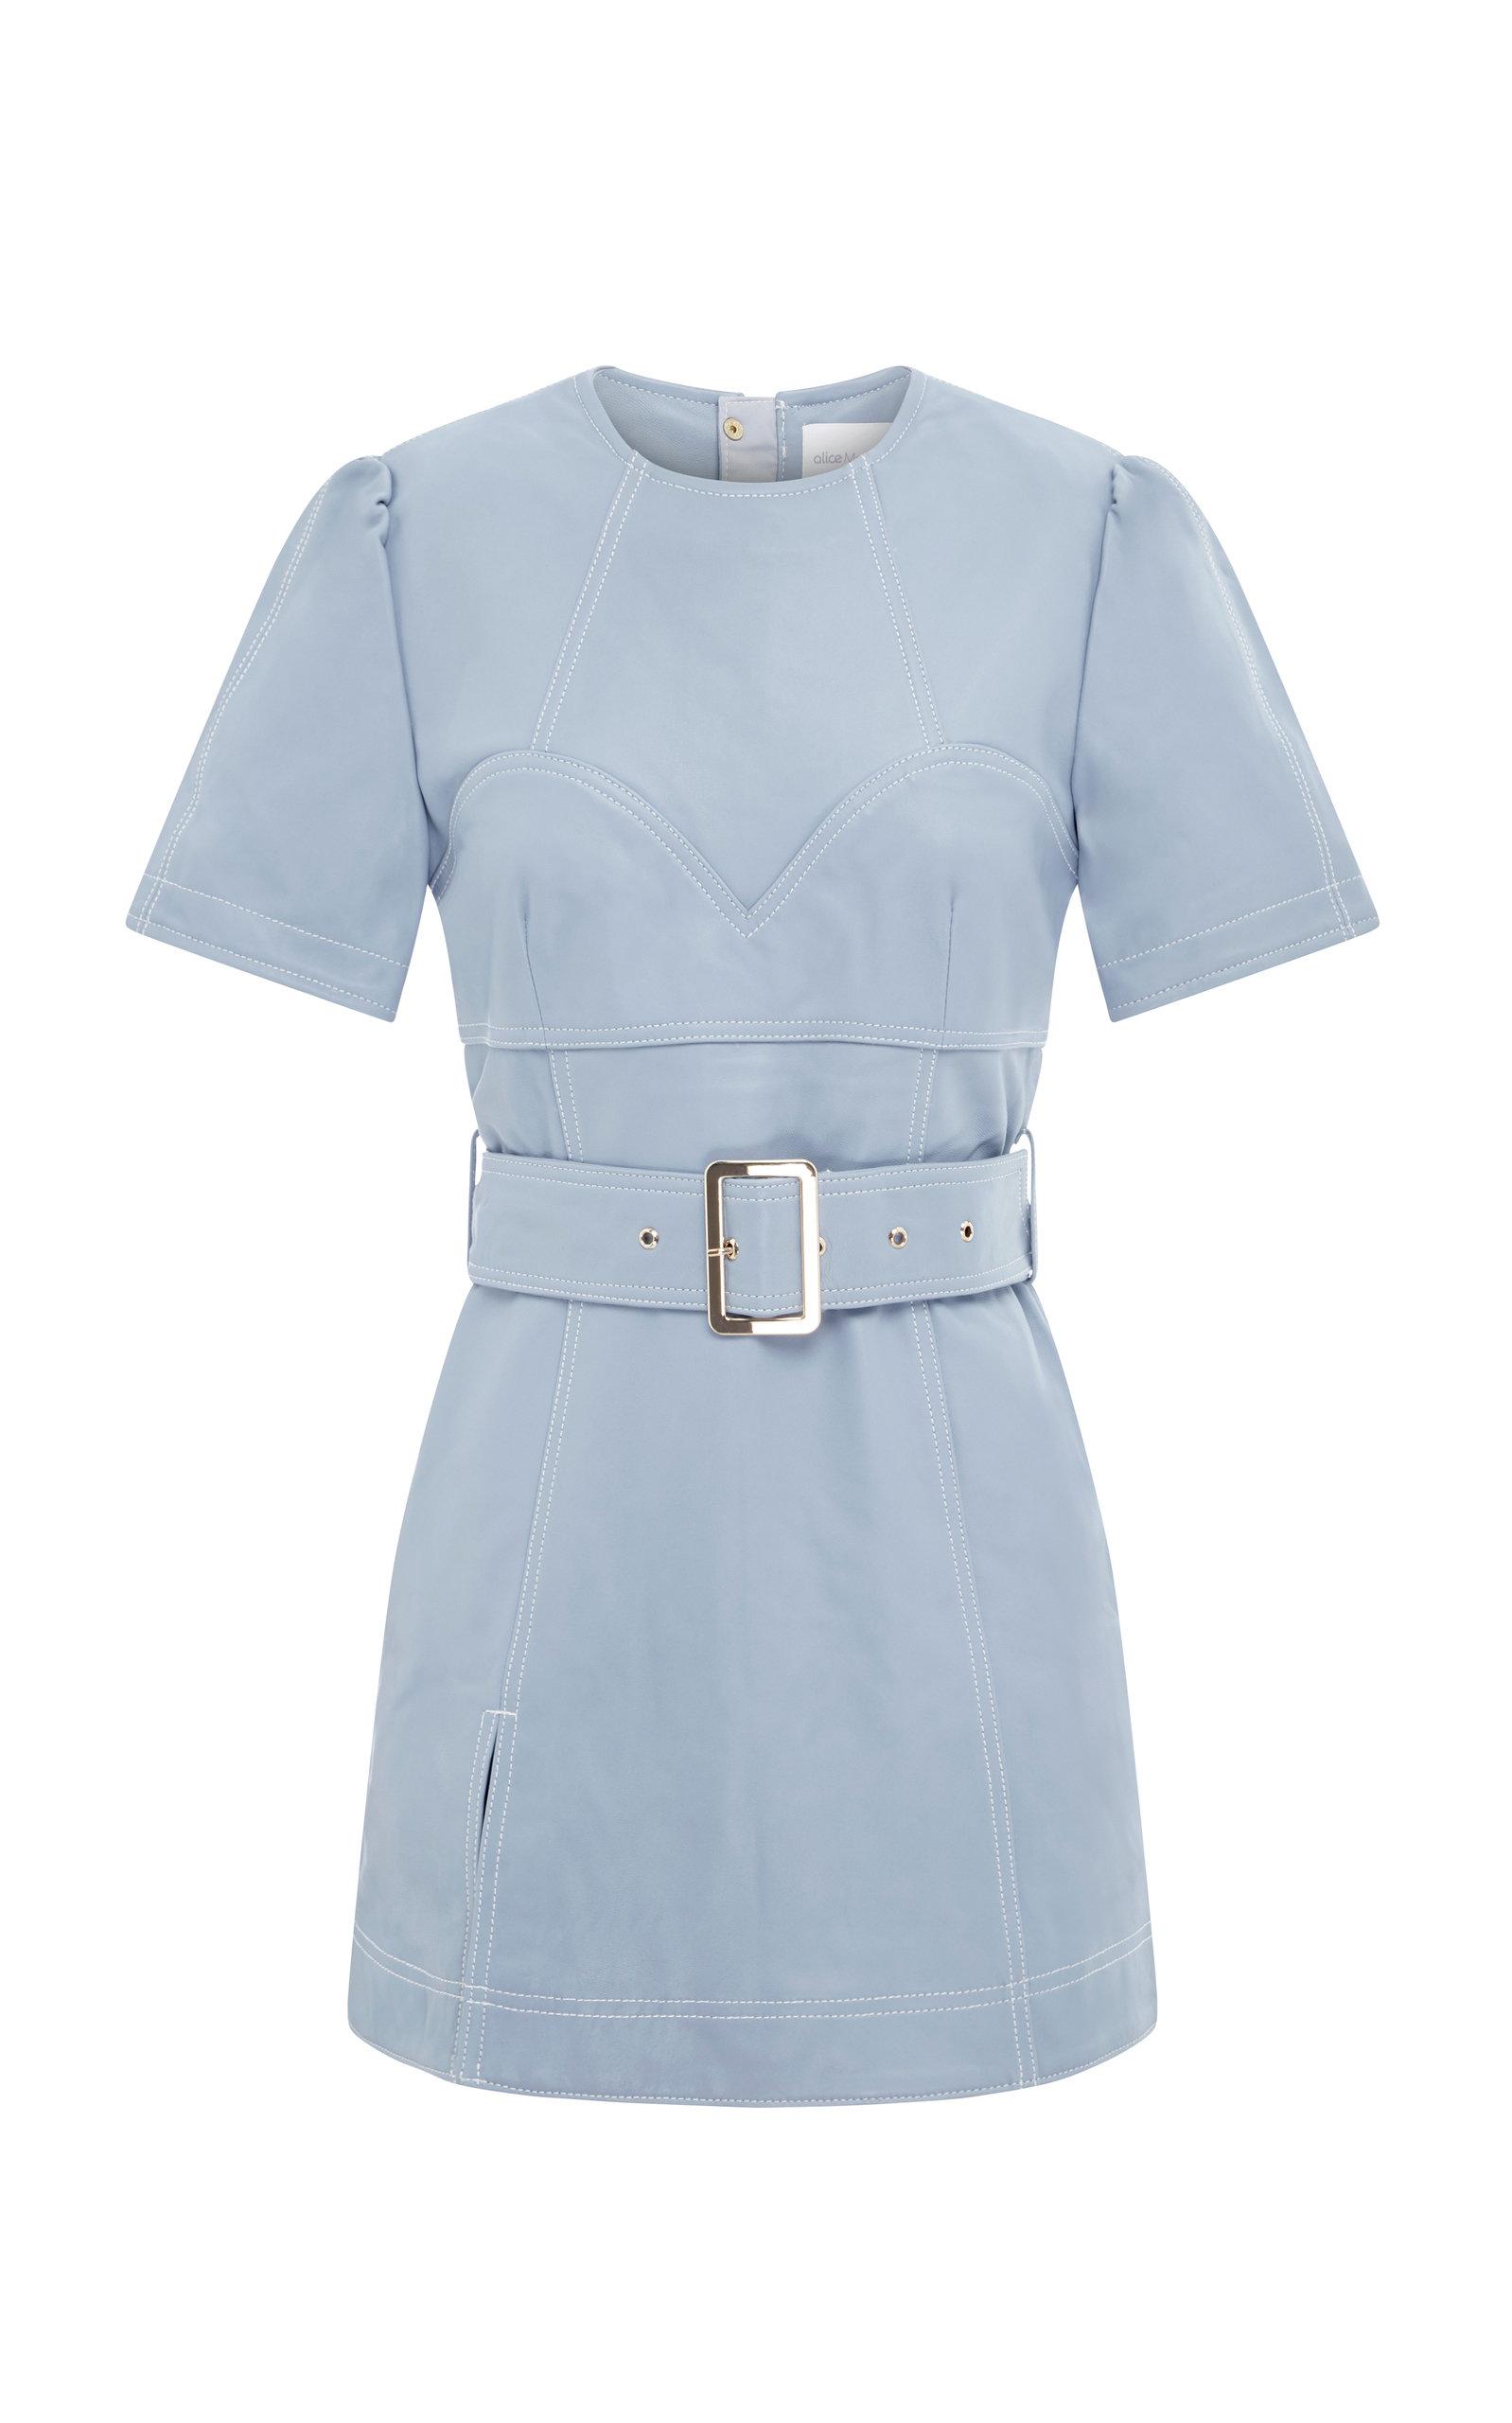 Alice Mccall | Alice McCall Incantations Lamb Leather Mini Dress | Clouty